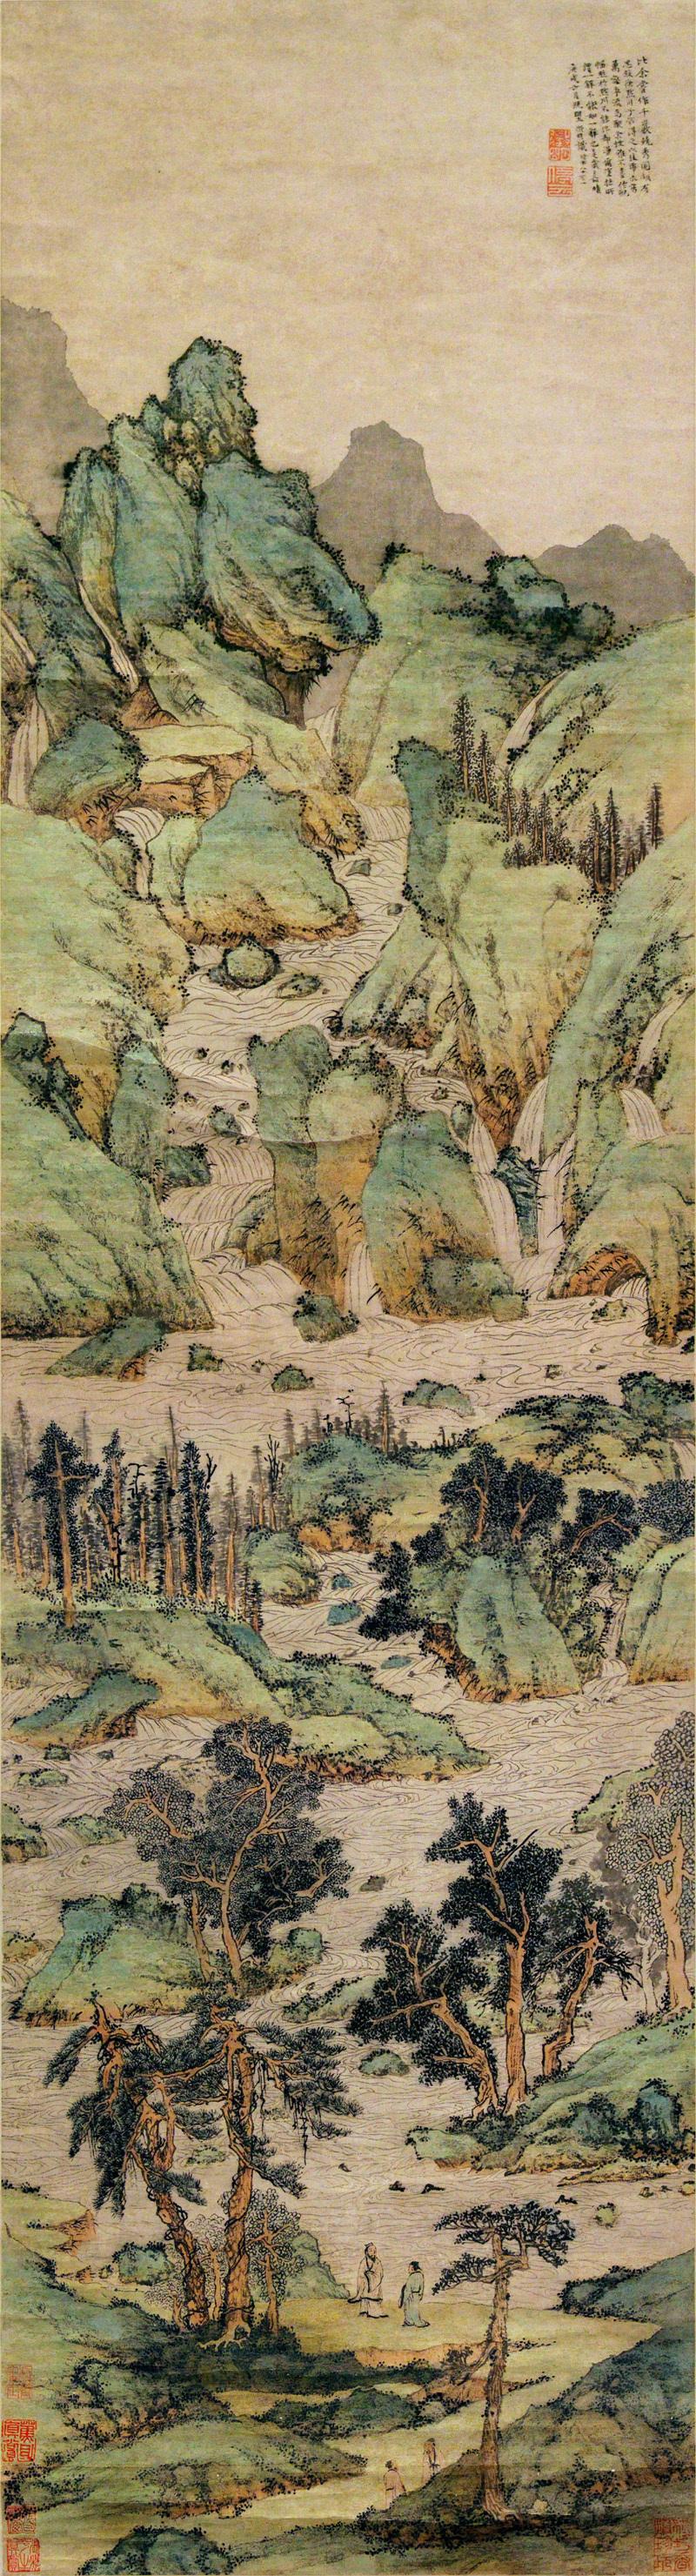 wen-zhengming_myriads-of-valleys